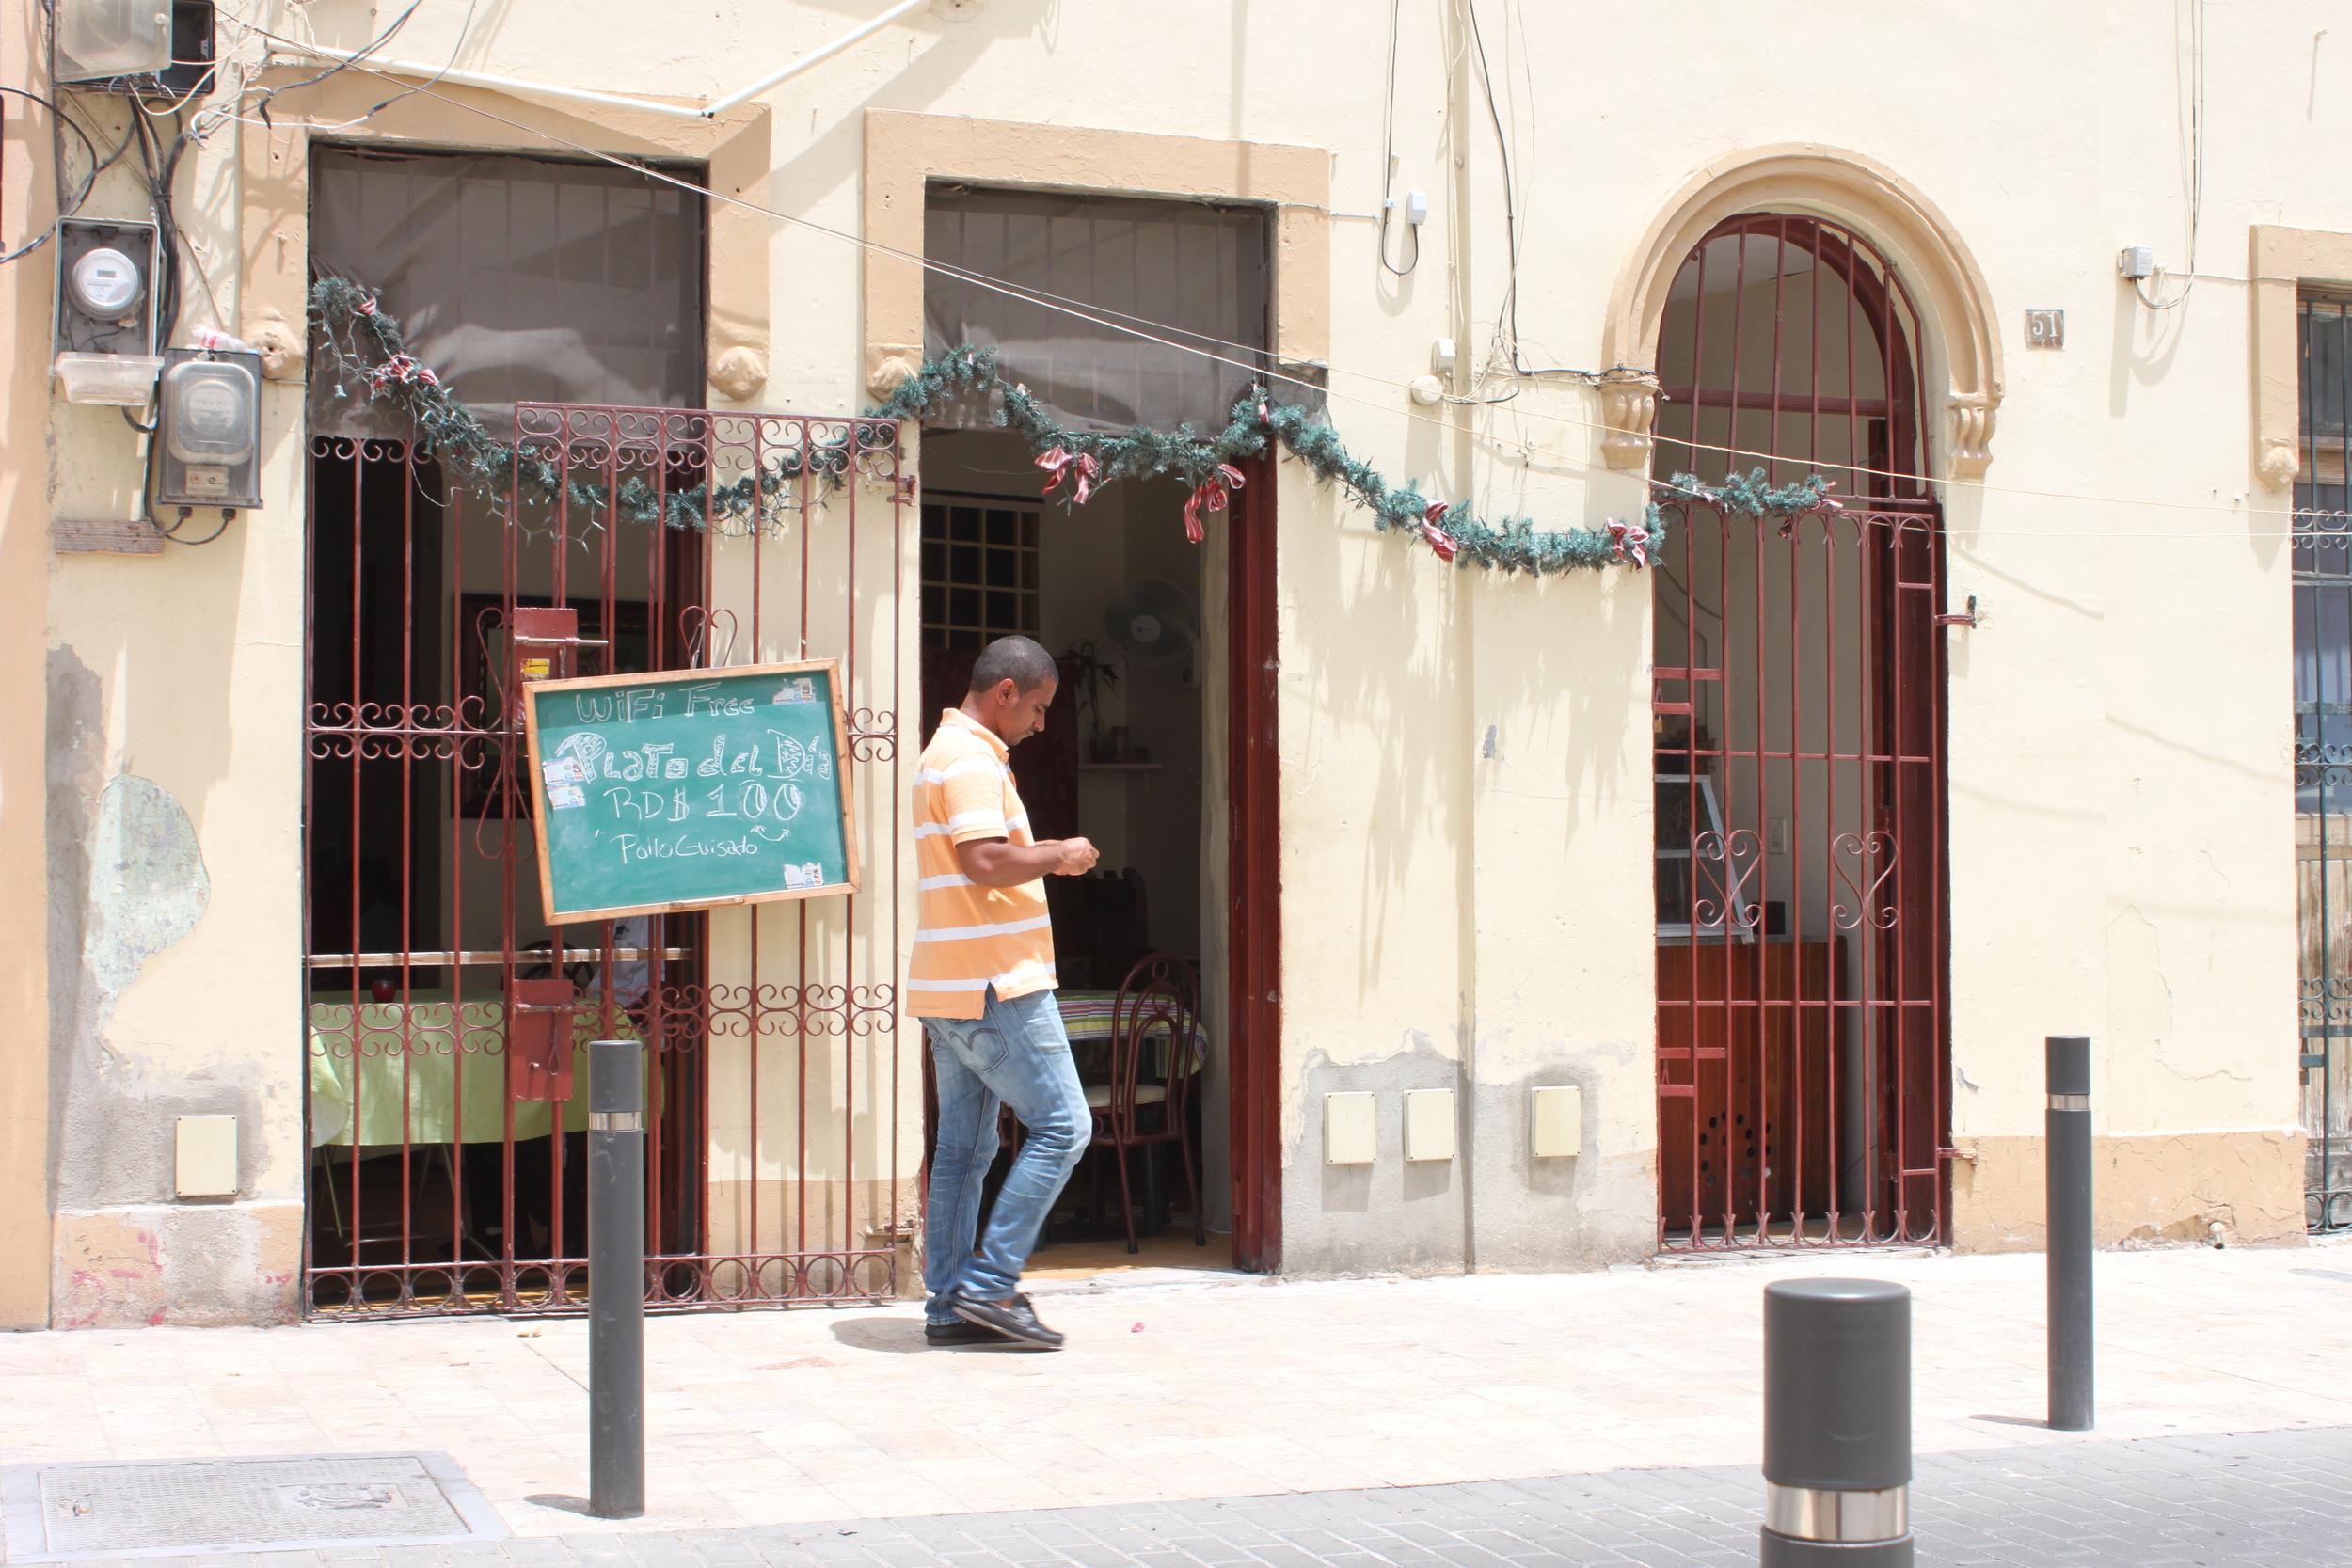 Free wifi in a 6-table cafe in Santo Domingo, Dominican Republic